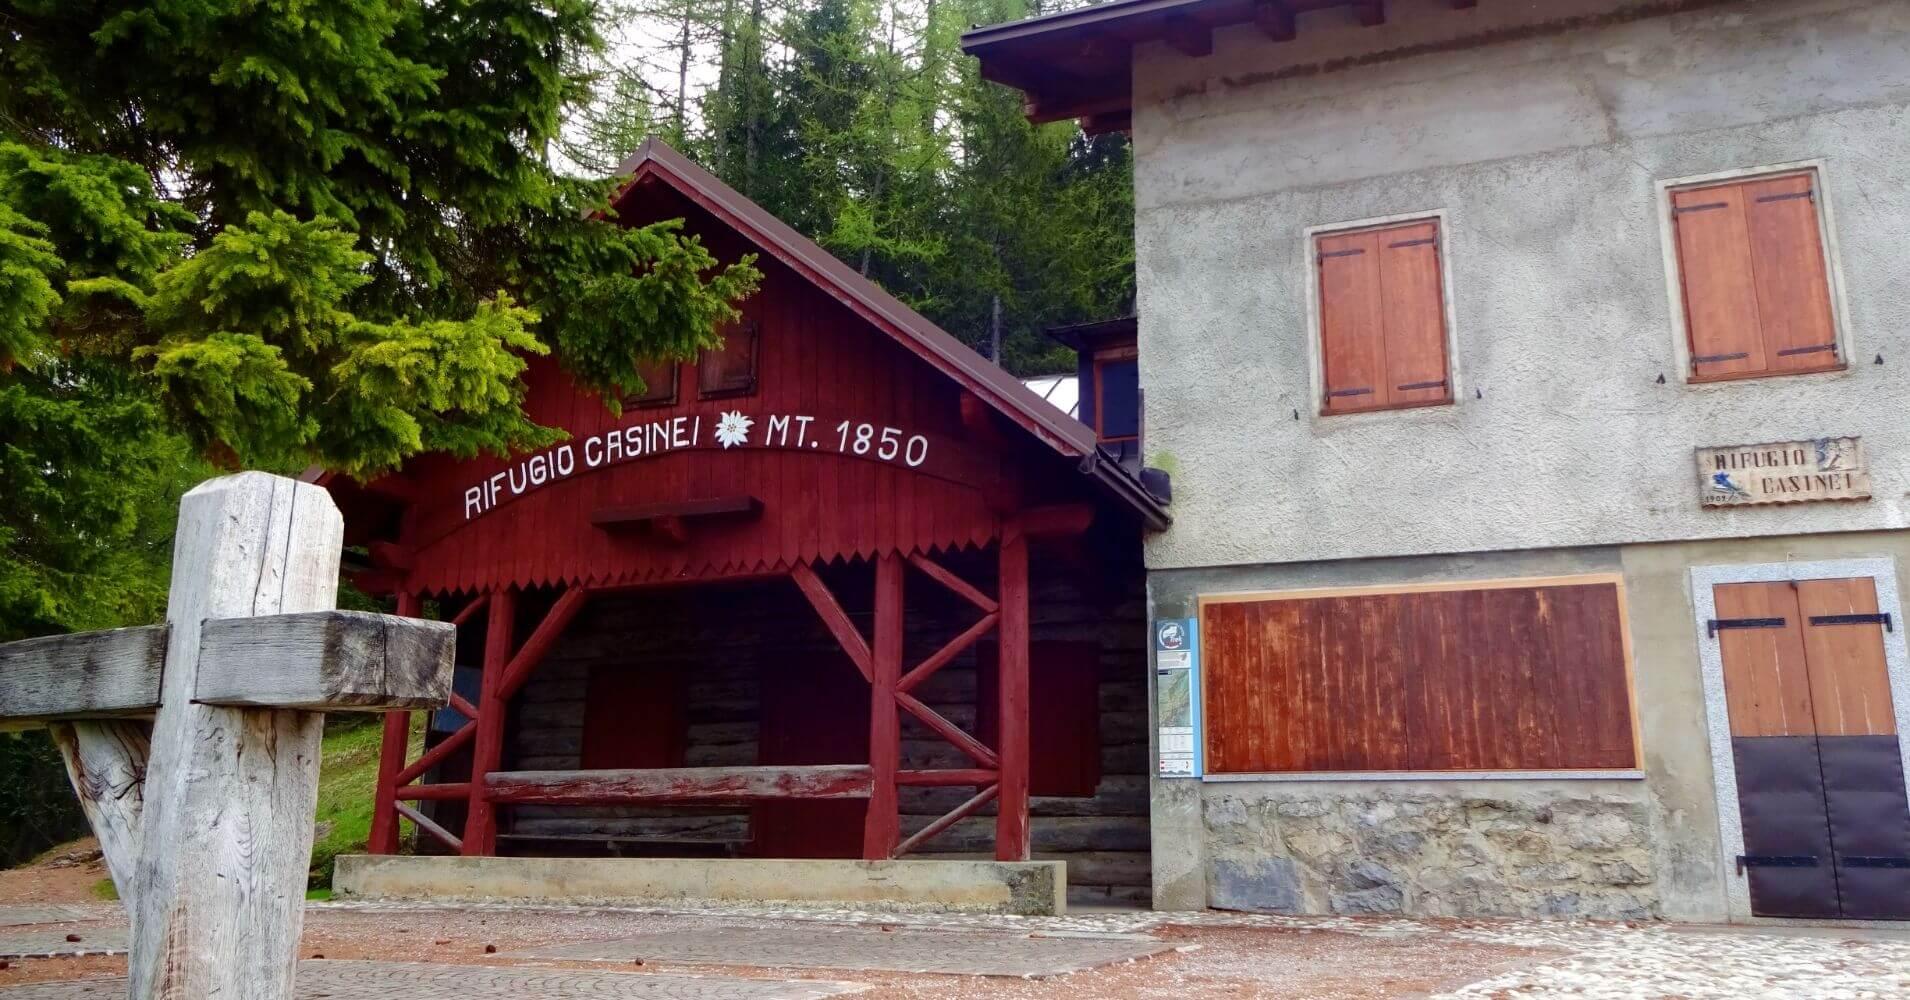 Refugio de Casinei. Dolomitas de Brenta. Madona di Campiglio. Trentino Alto Adigio. Italia.